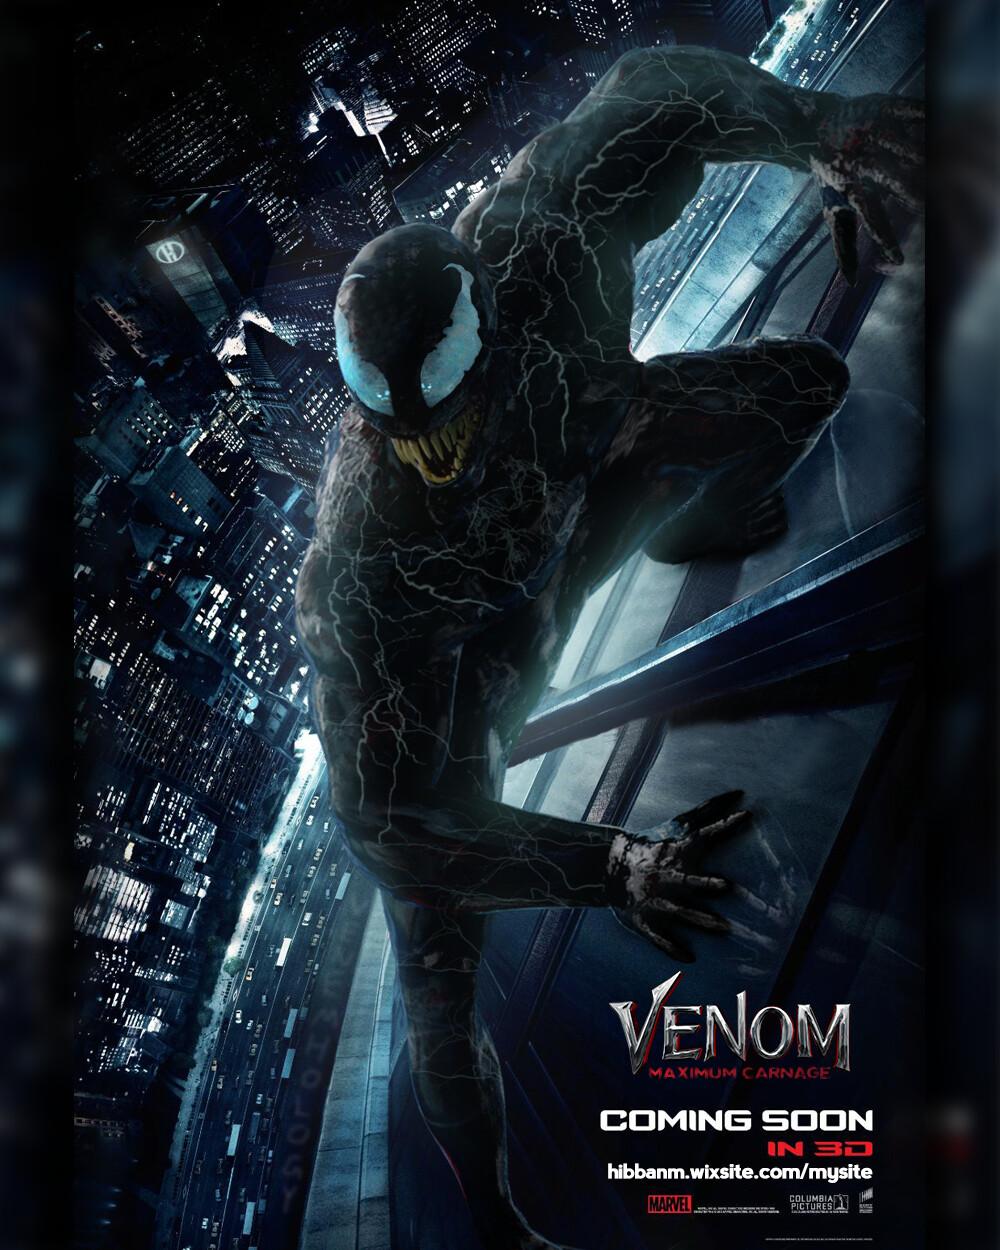 Hibban Mohammed Venom Maximum Carnage Concept Poster